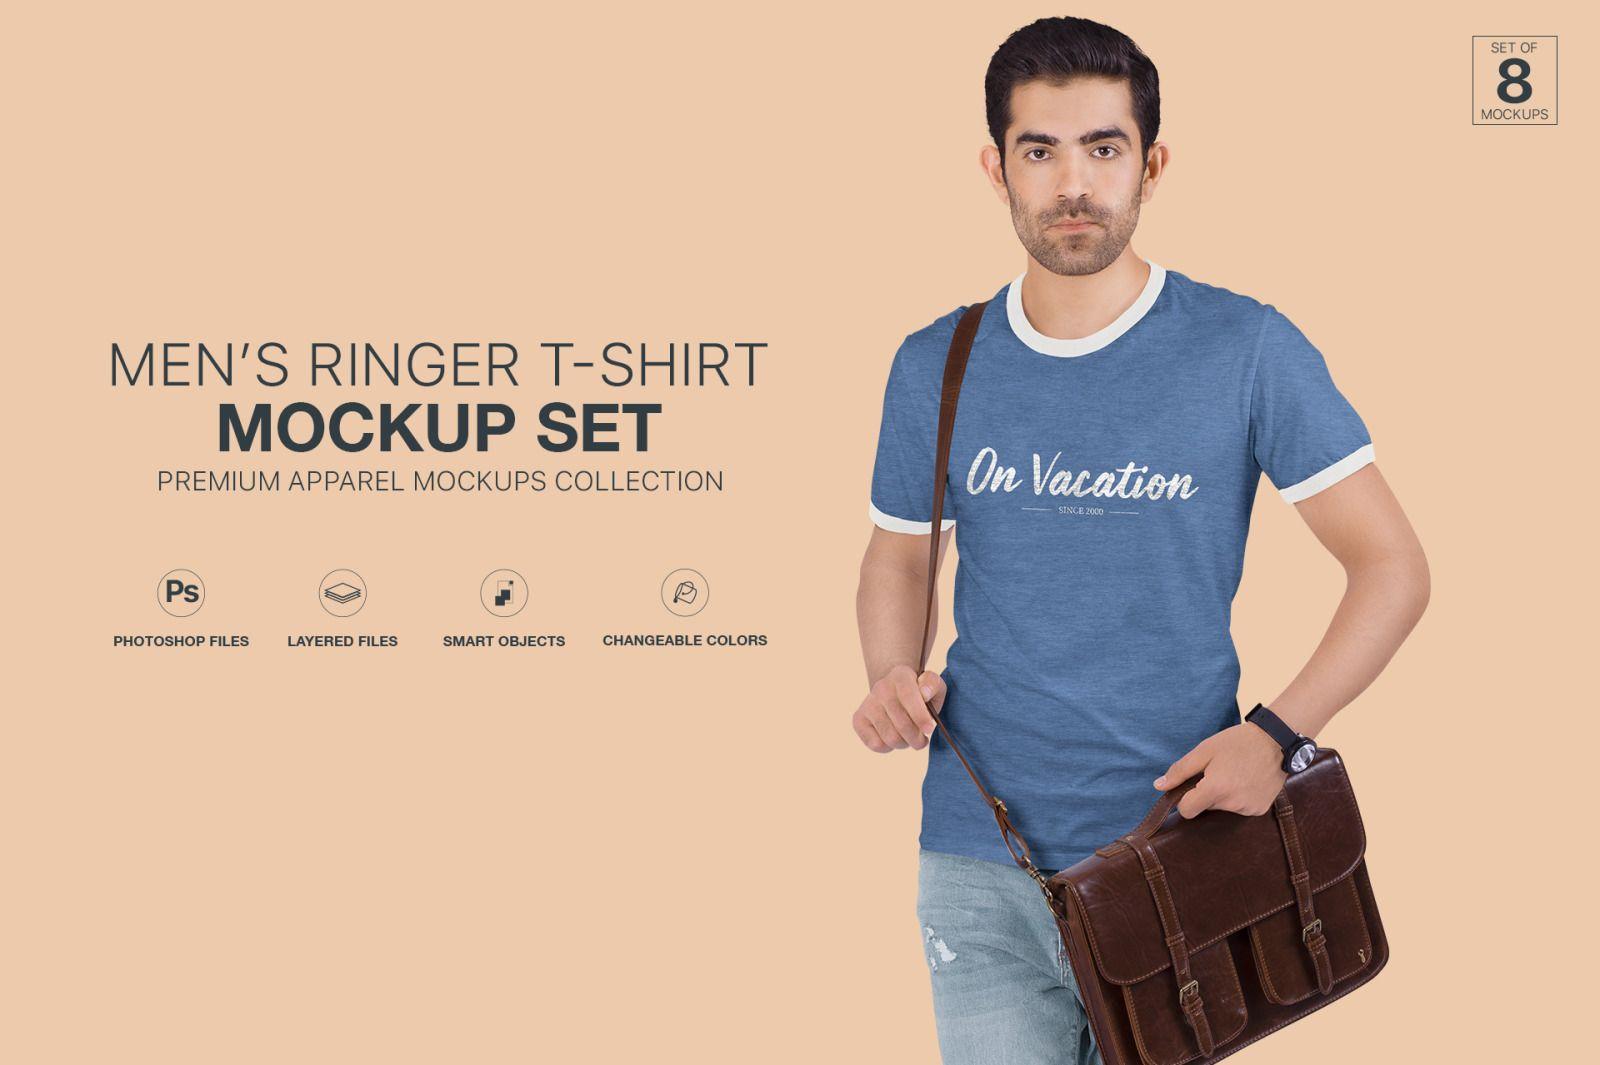 Download 29 Ide Free Design T Shirt Mockup Geber Com Kaos Desain